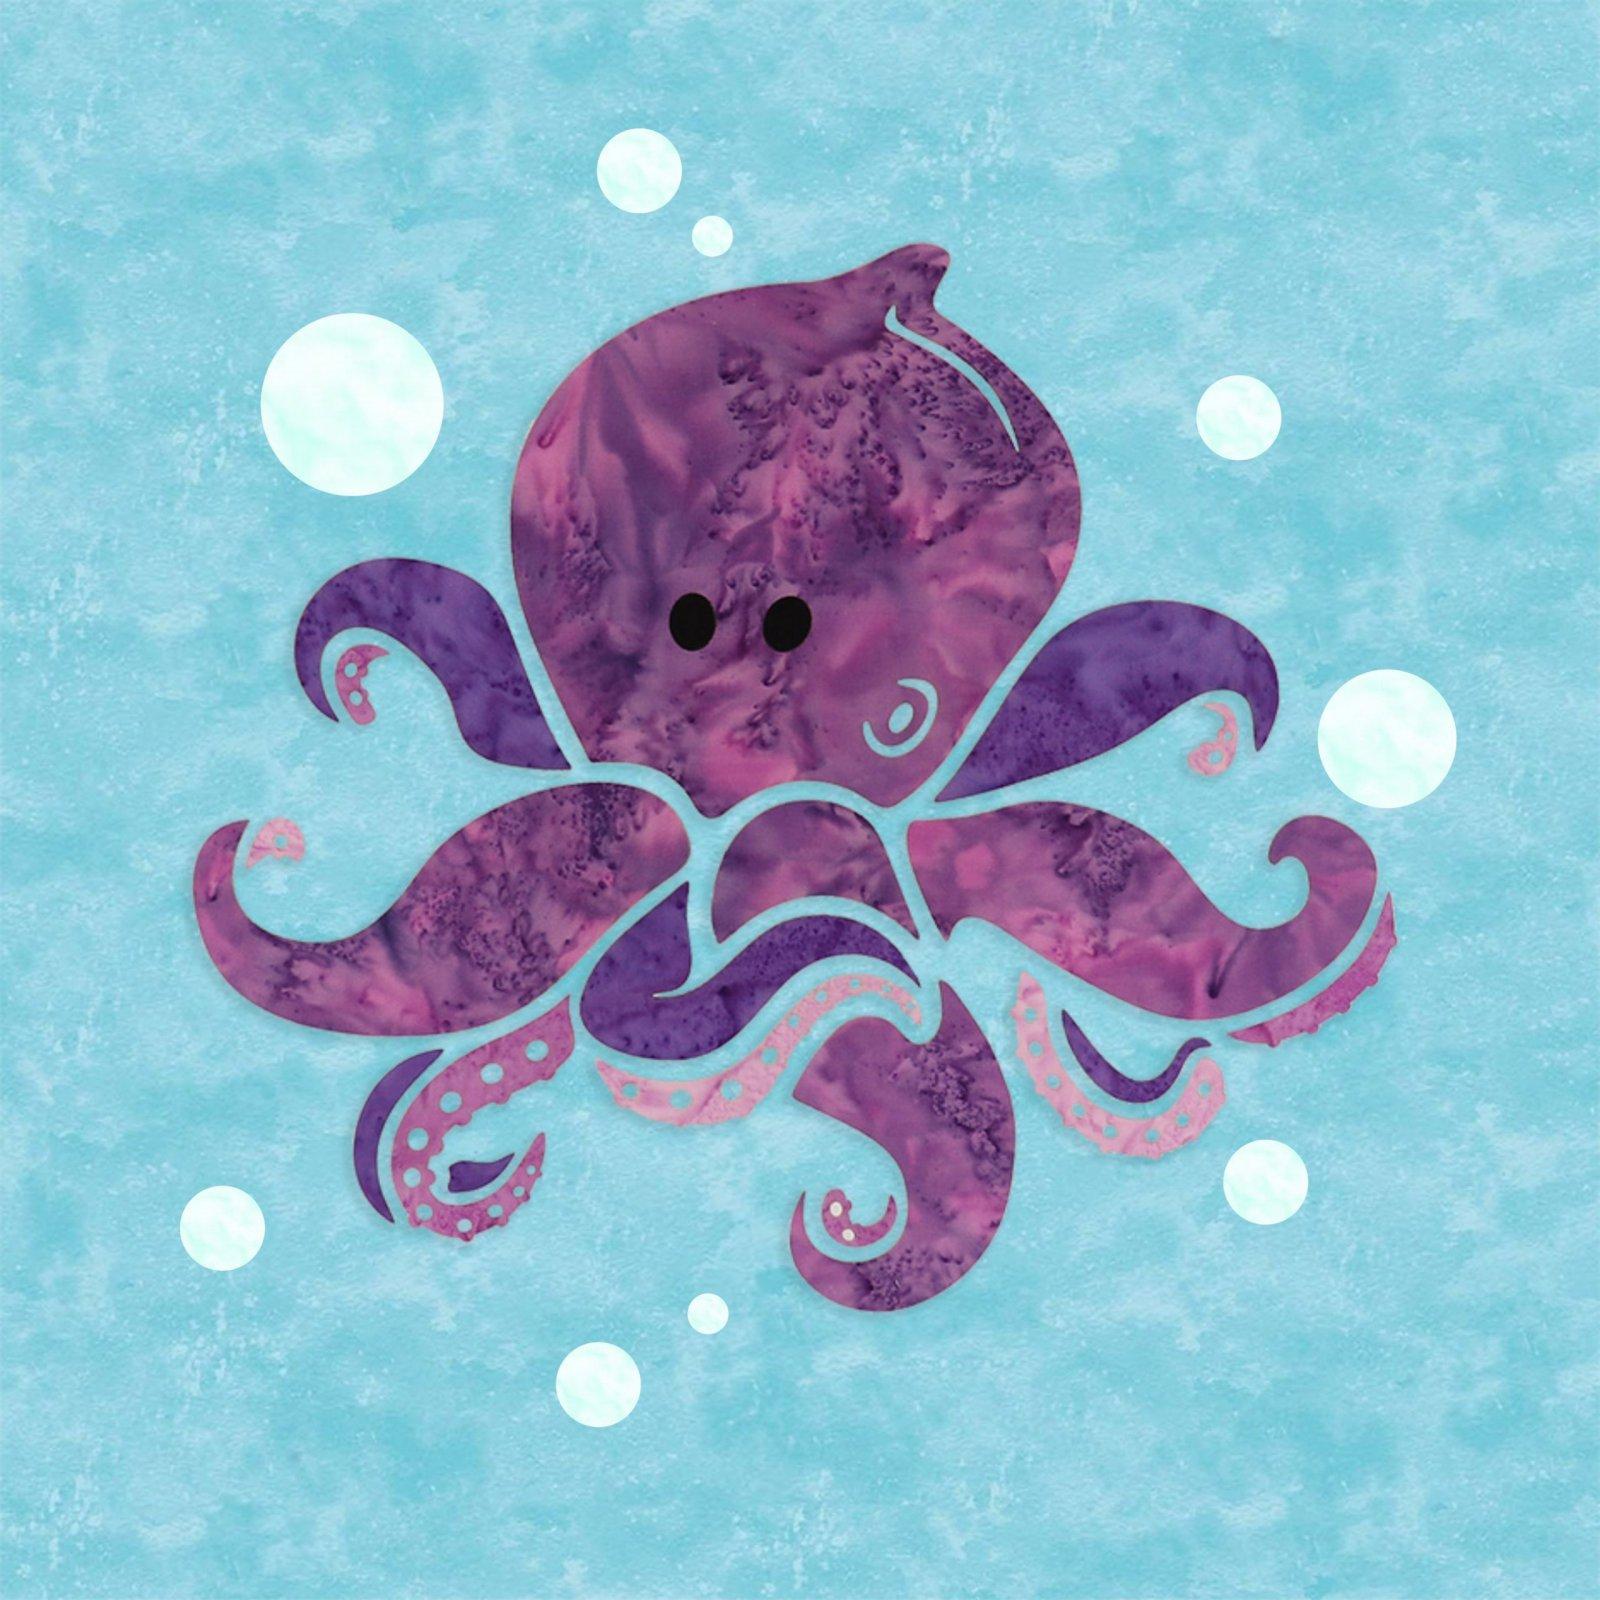 Octopus (15 x 15) - Laser Cut Applique Pieces